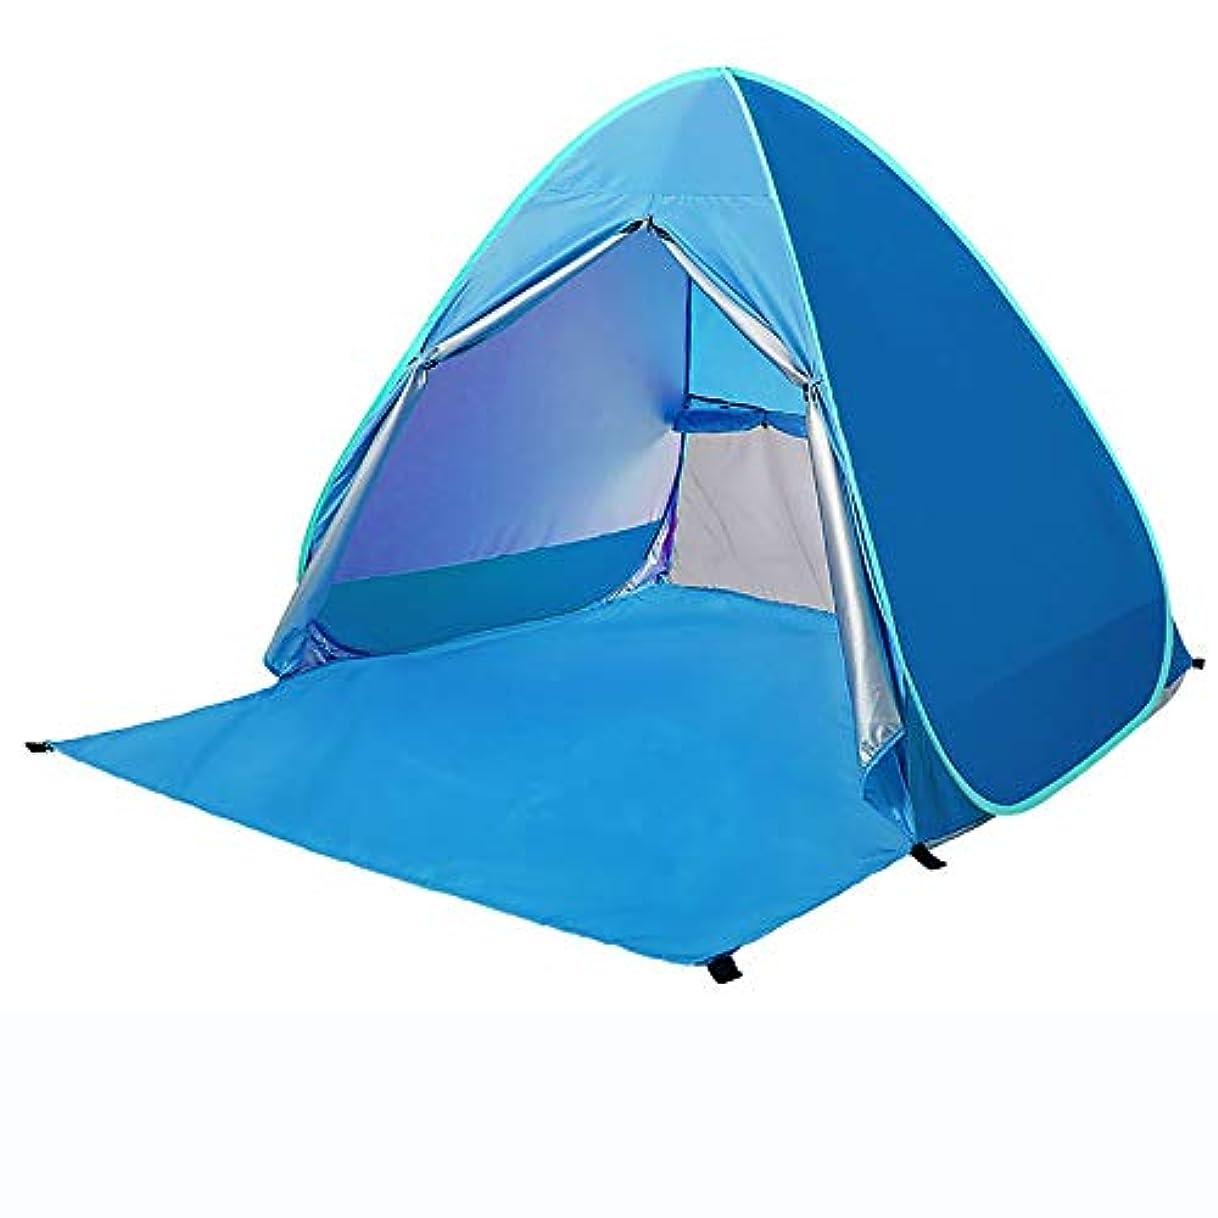 自動車素朴なヘビー3-4人户外帐篷fangUV50 +户外沙滩帐篷可折叠自动速开帐篷